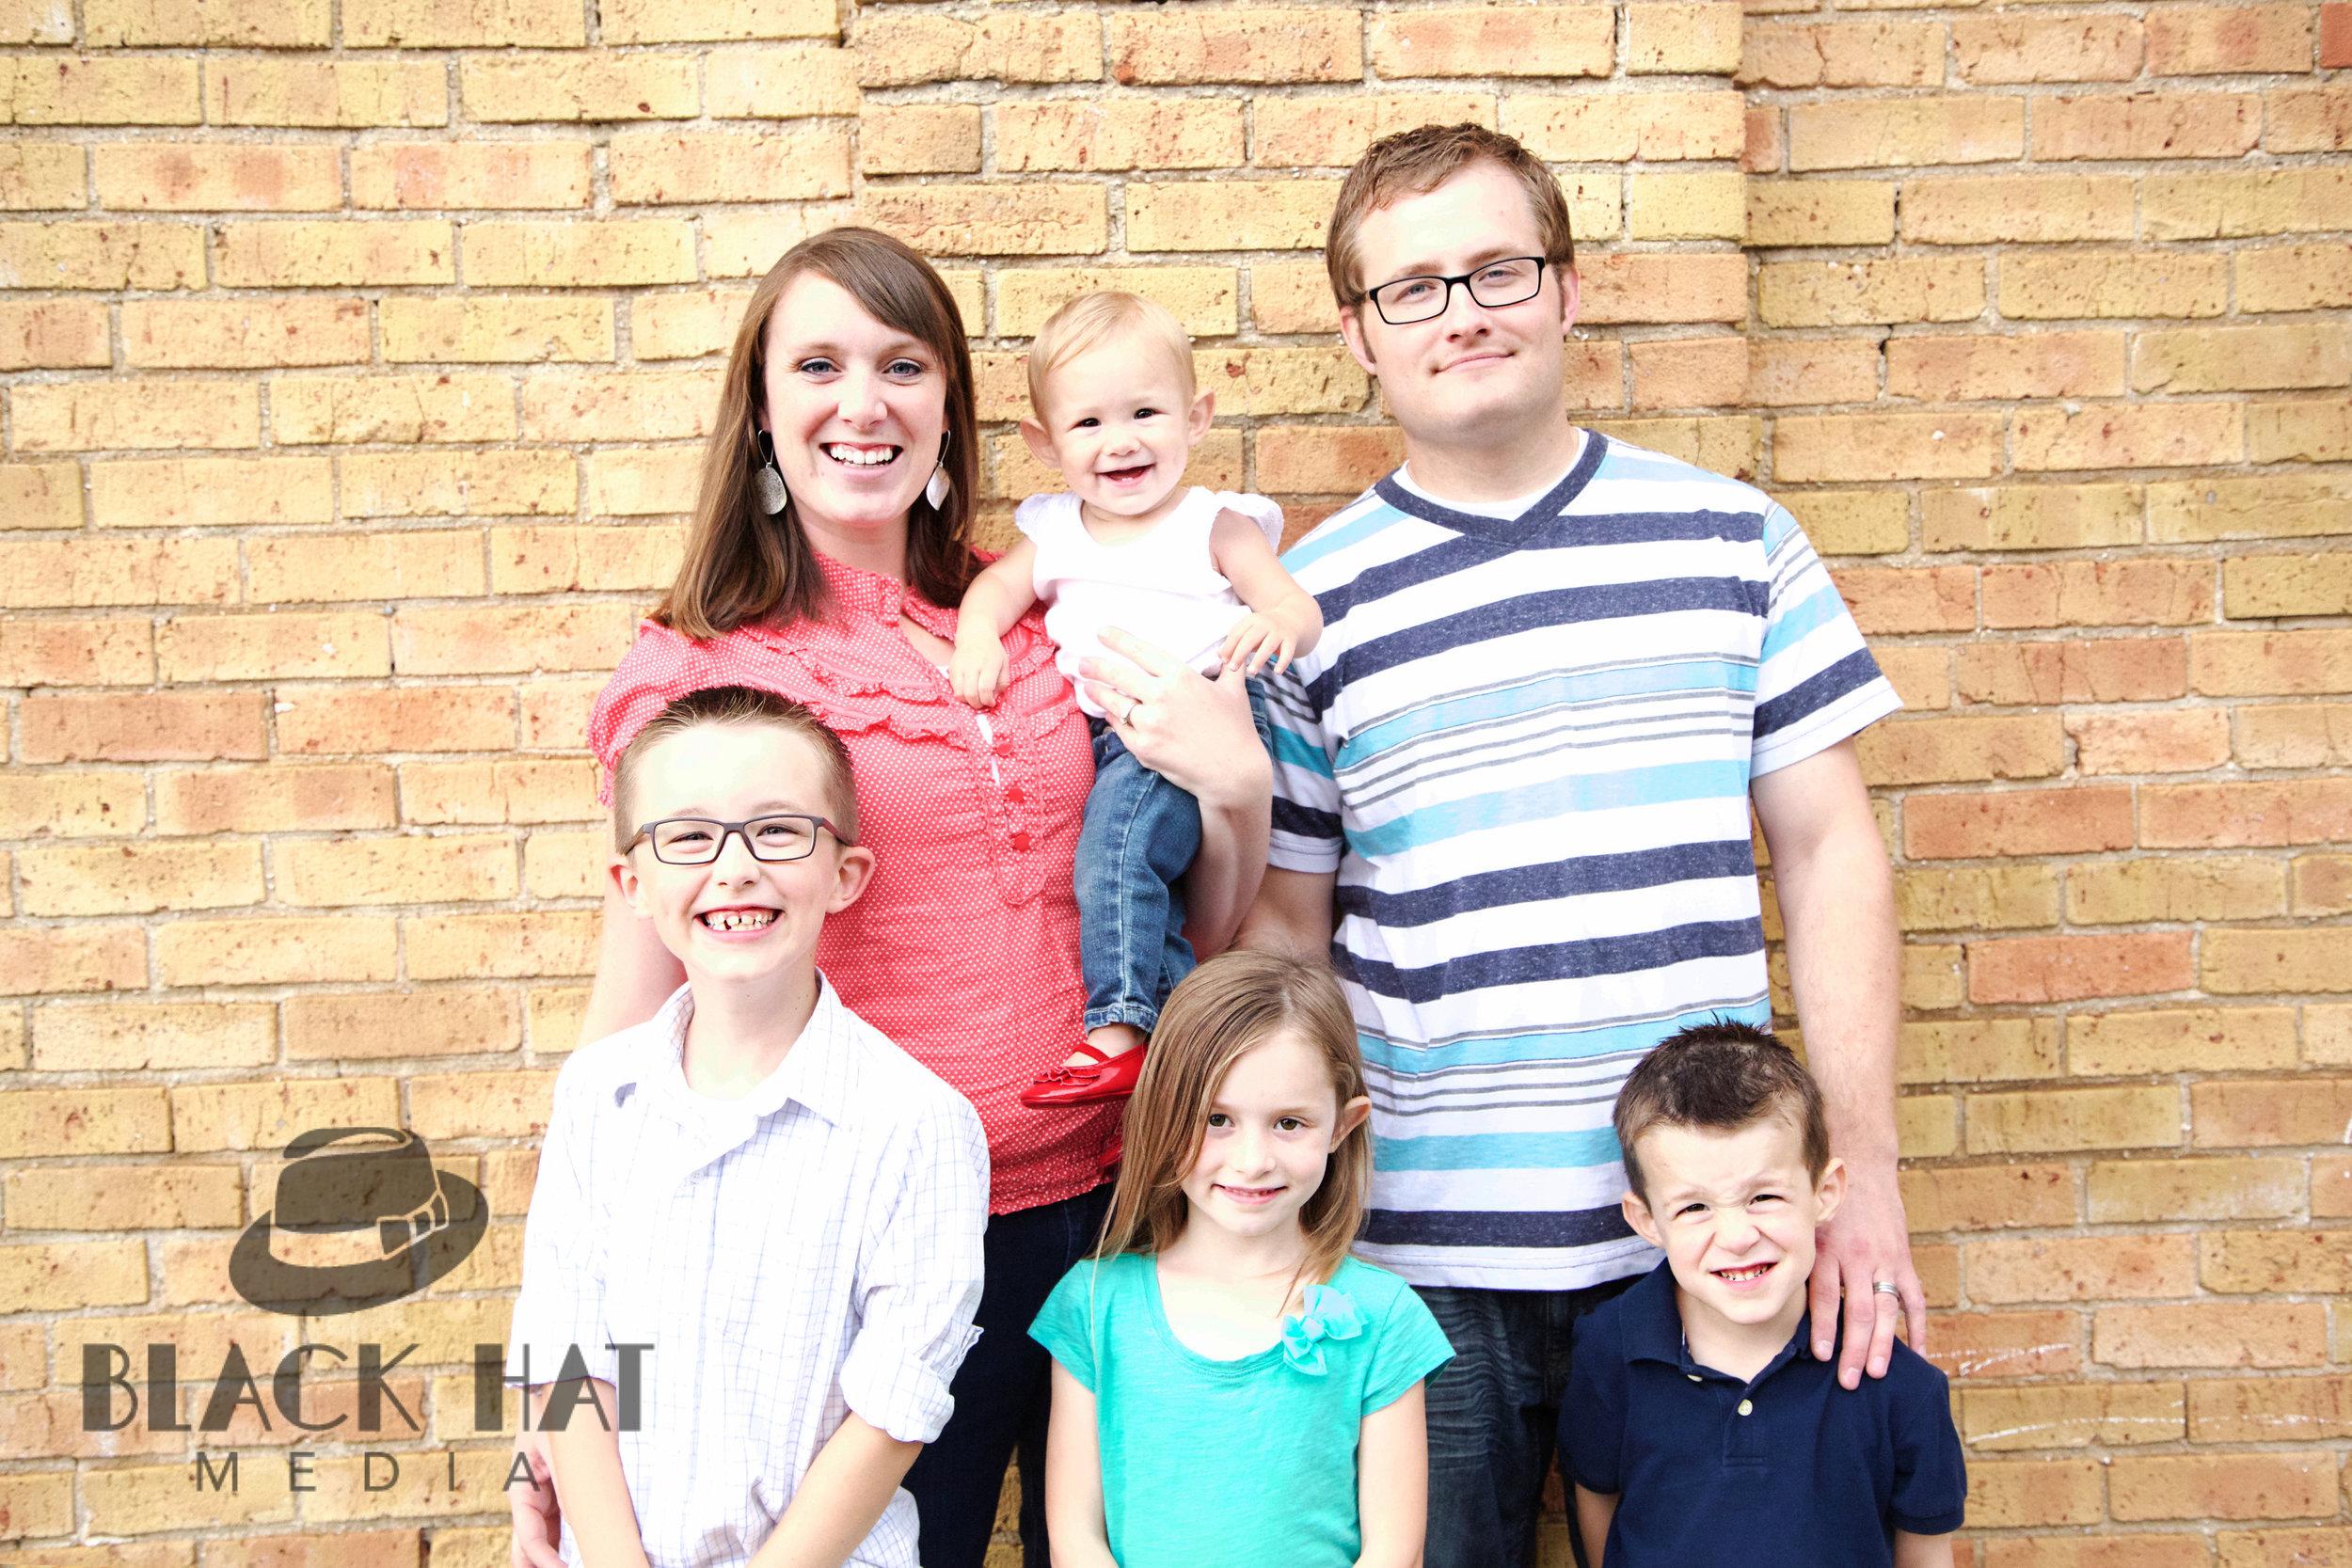 utahfamilyphotography-7.jpg